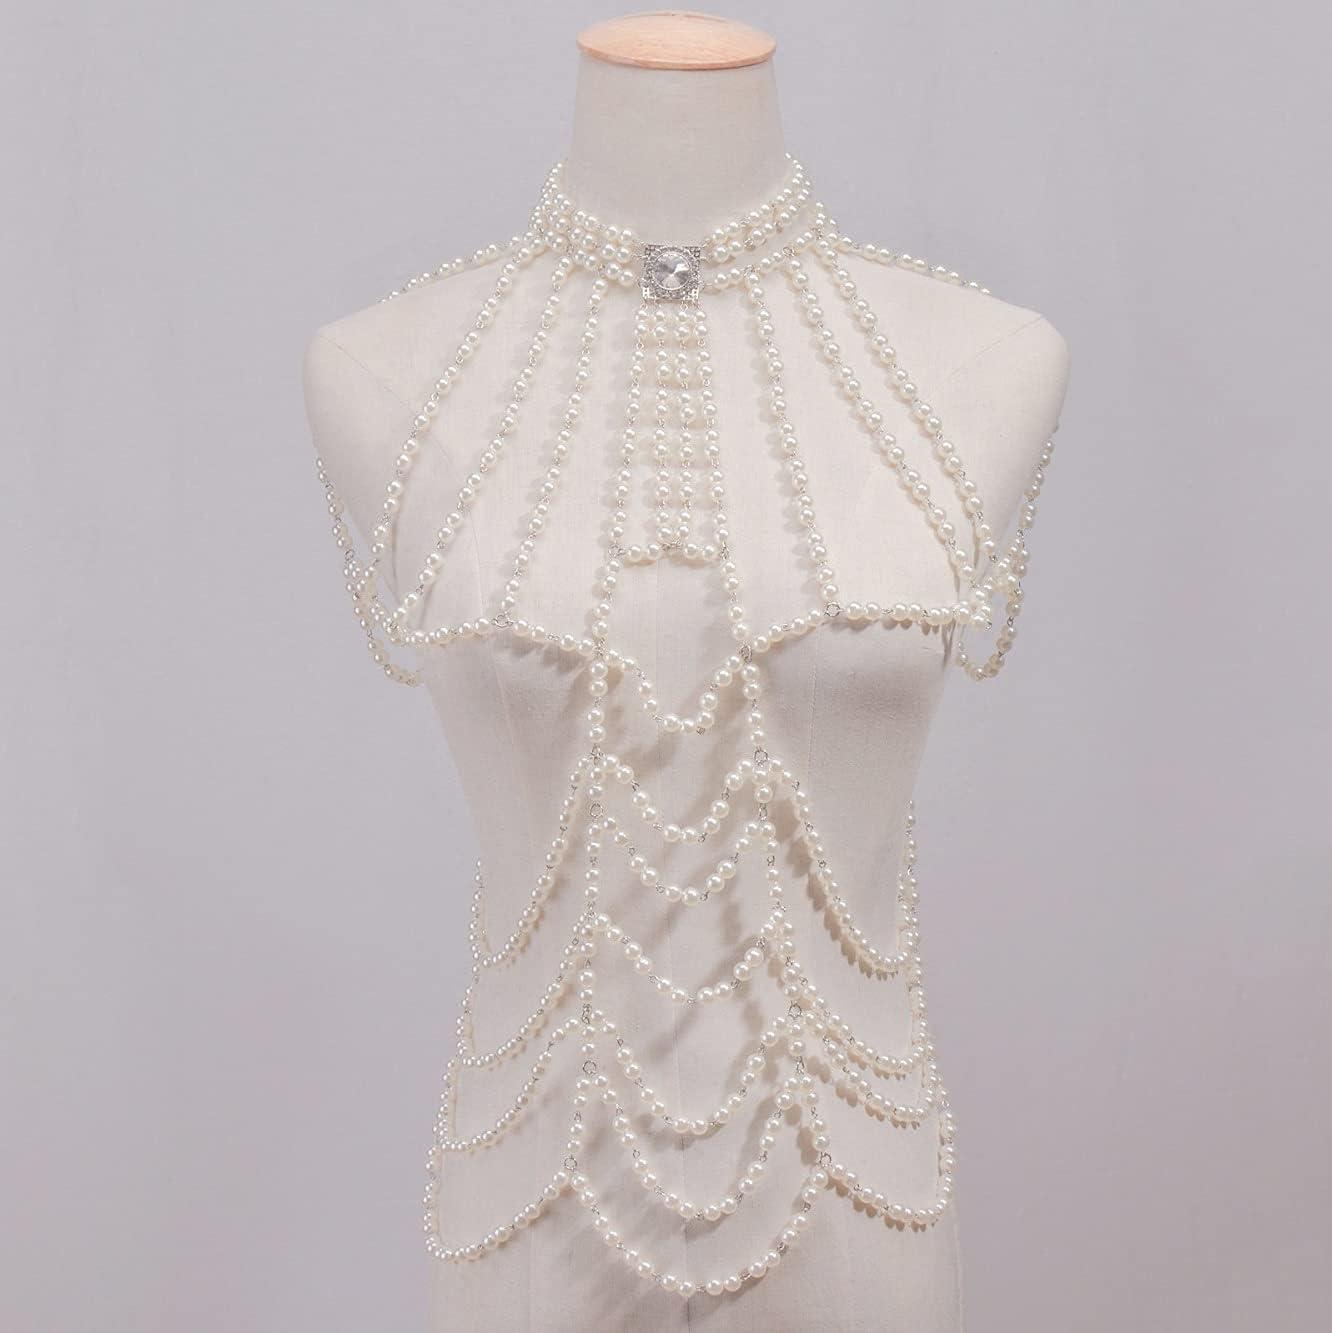 UXZDX Boho Imitation Pearls Statement Chains Pendant Dress Jewelry Pearls Beads Bikini Harness Body Chain Wedding Jewelry